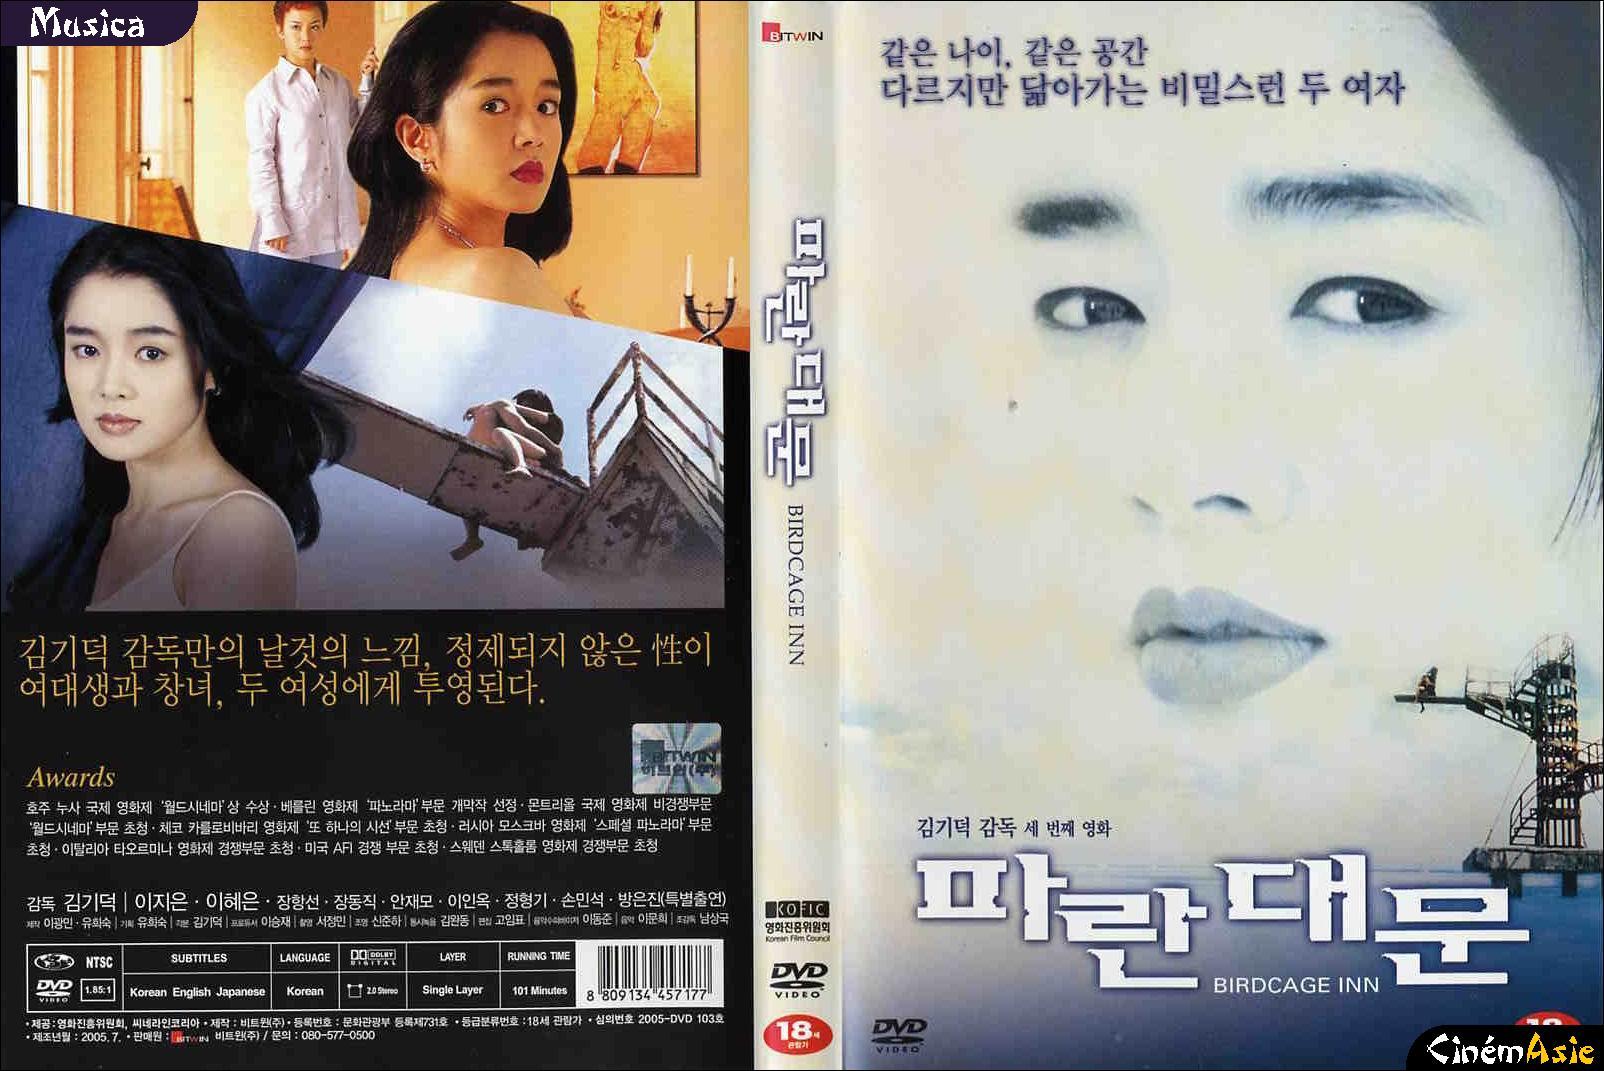 Birdcage Inn / 1998 / Güney Kore / Online Film İzle